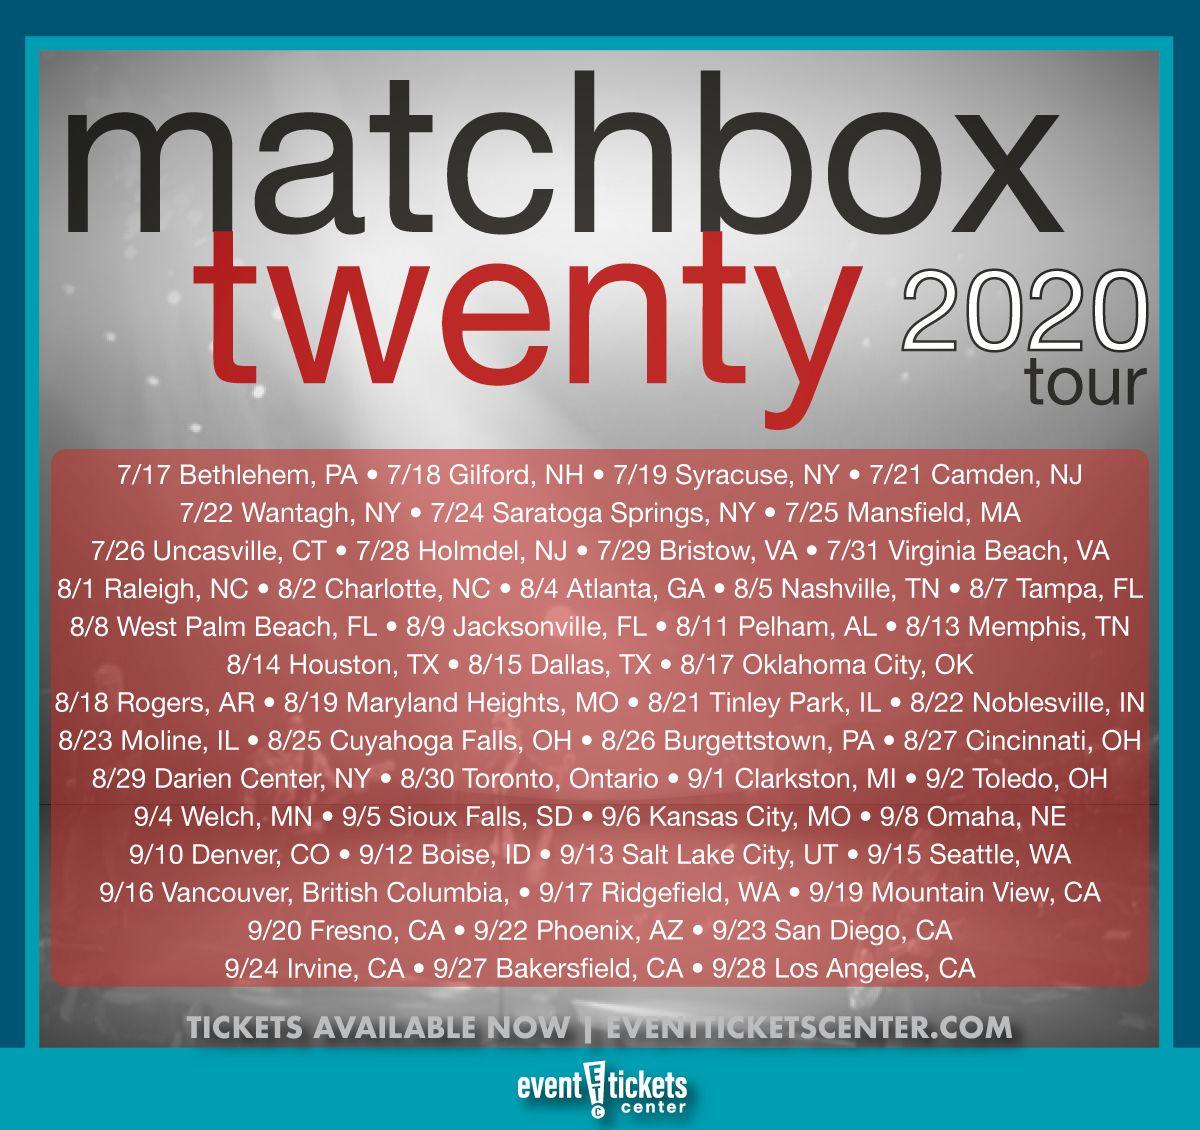 Matchbox Twenty 2020 Tour Dates & Tickets in 2020 (With